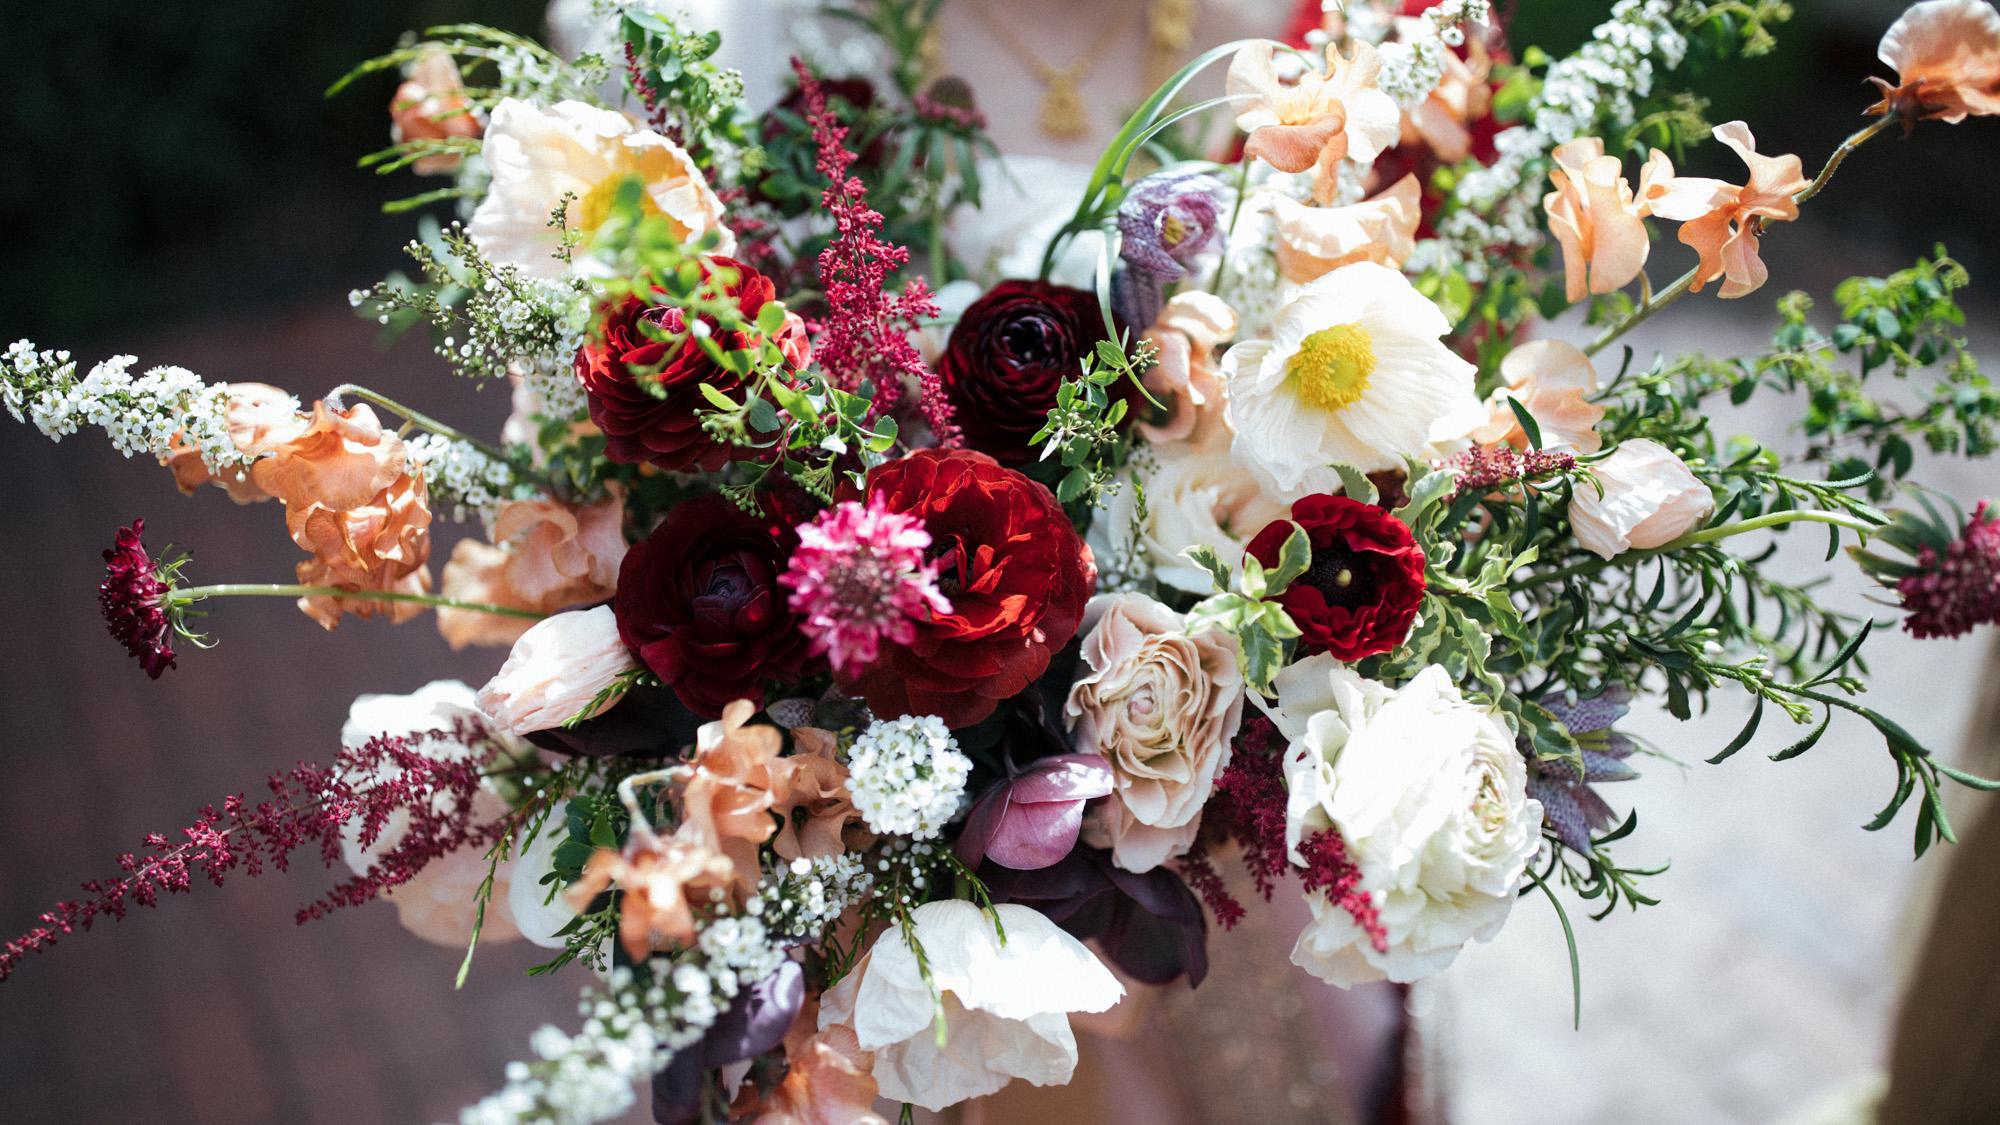 anu_maneesh_alec_vanderboom_Indian_wedding_photography-0059.jpg